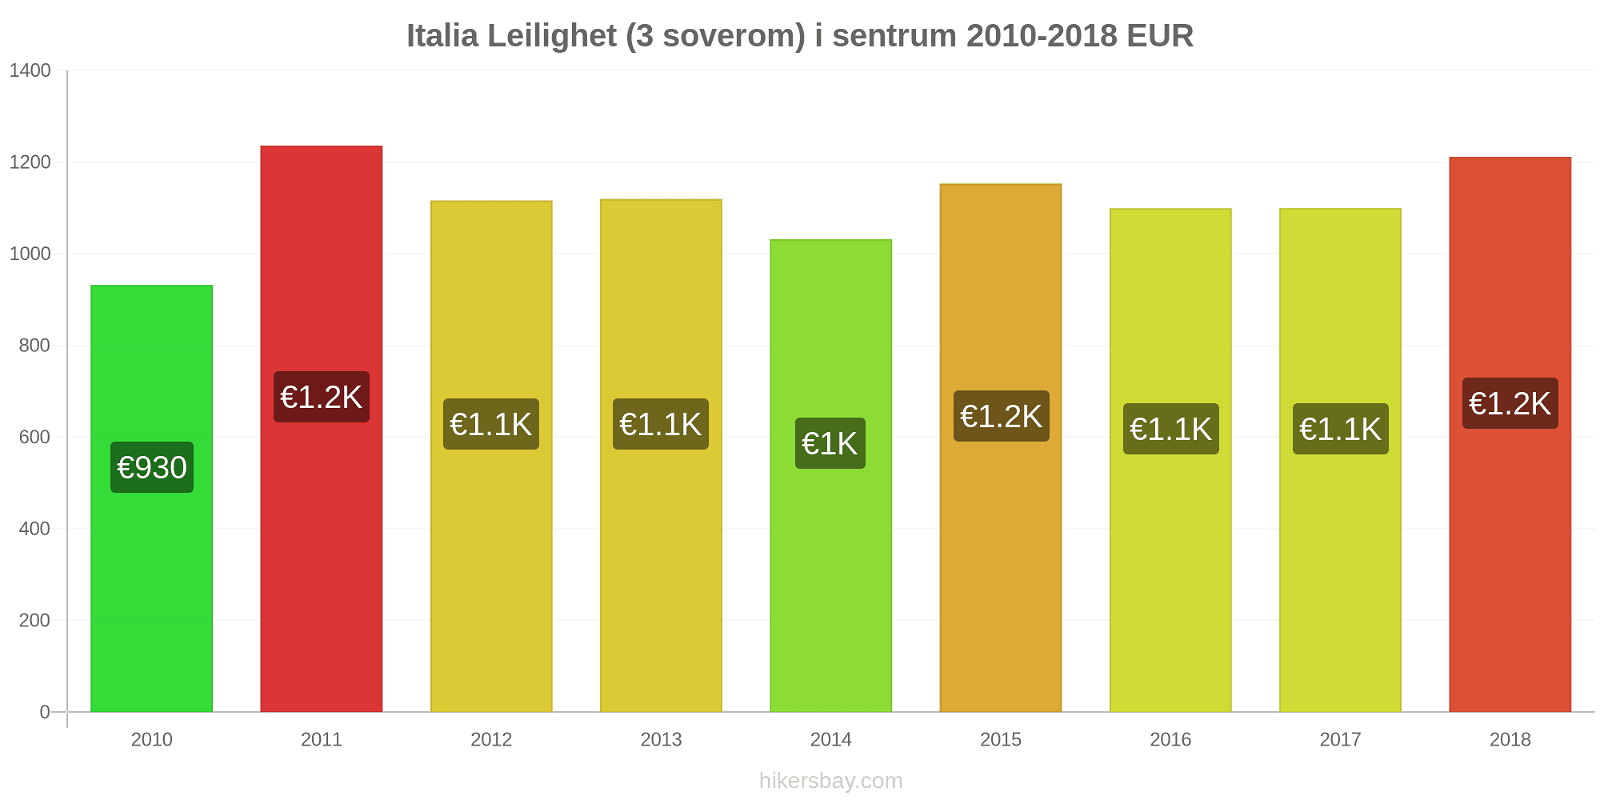 Italia prisendringer Leilighet (3 soverom) i sentrum hikersbay.com